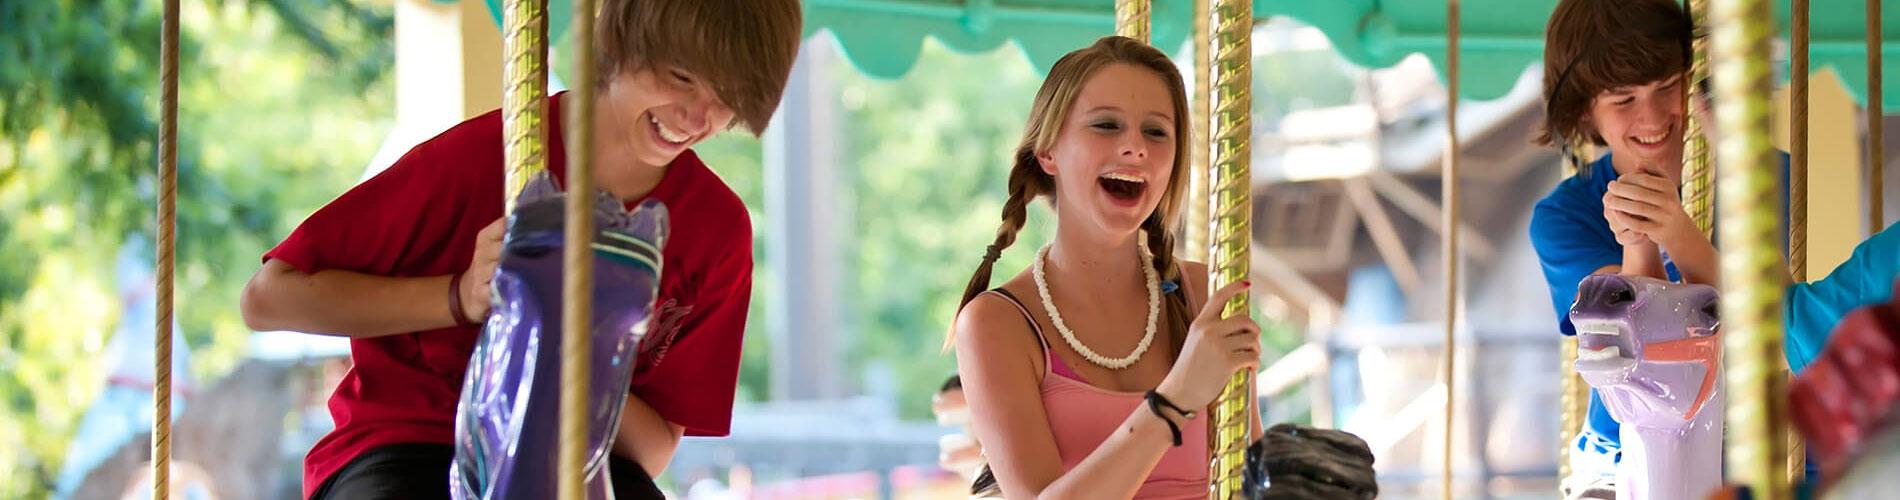 Kinder-Karussel - Merry-go-round, carousel